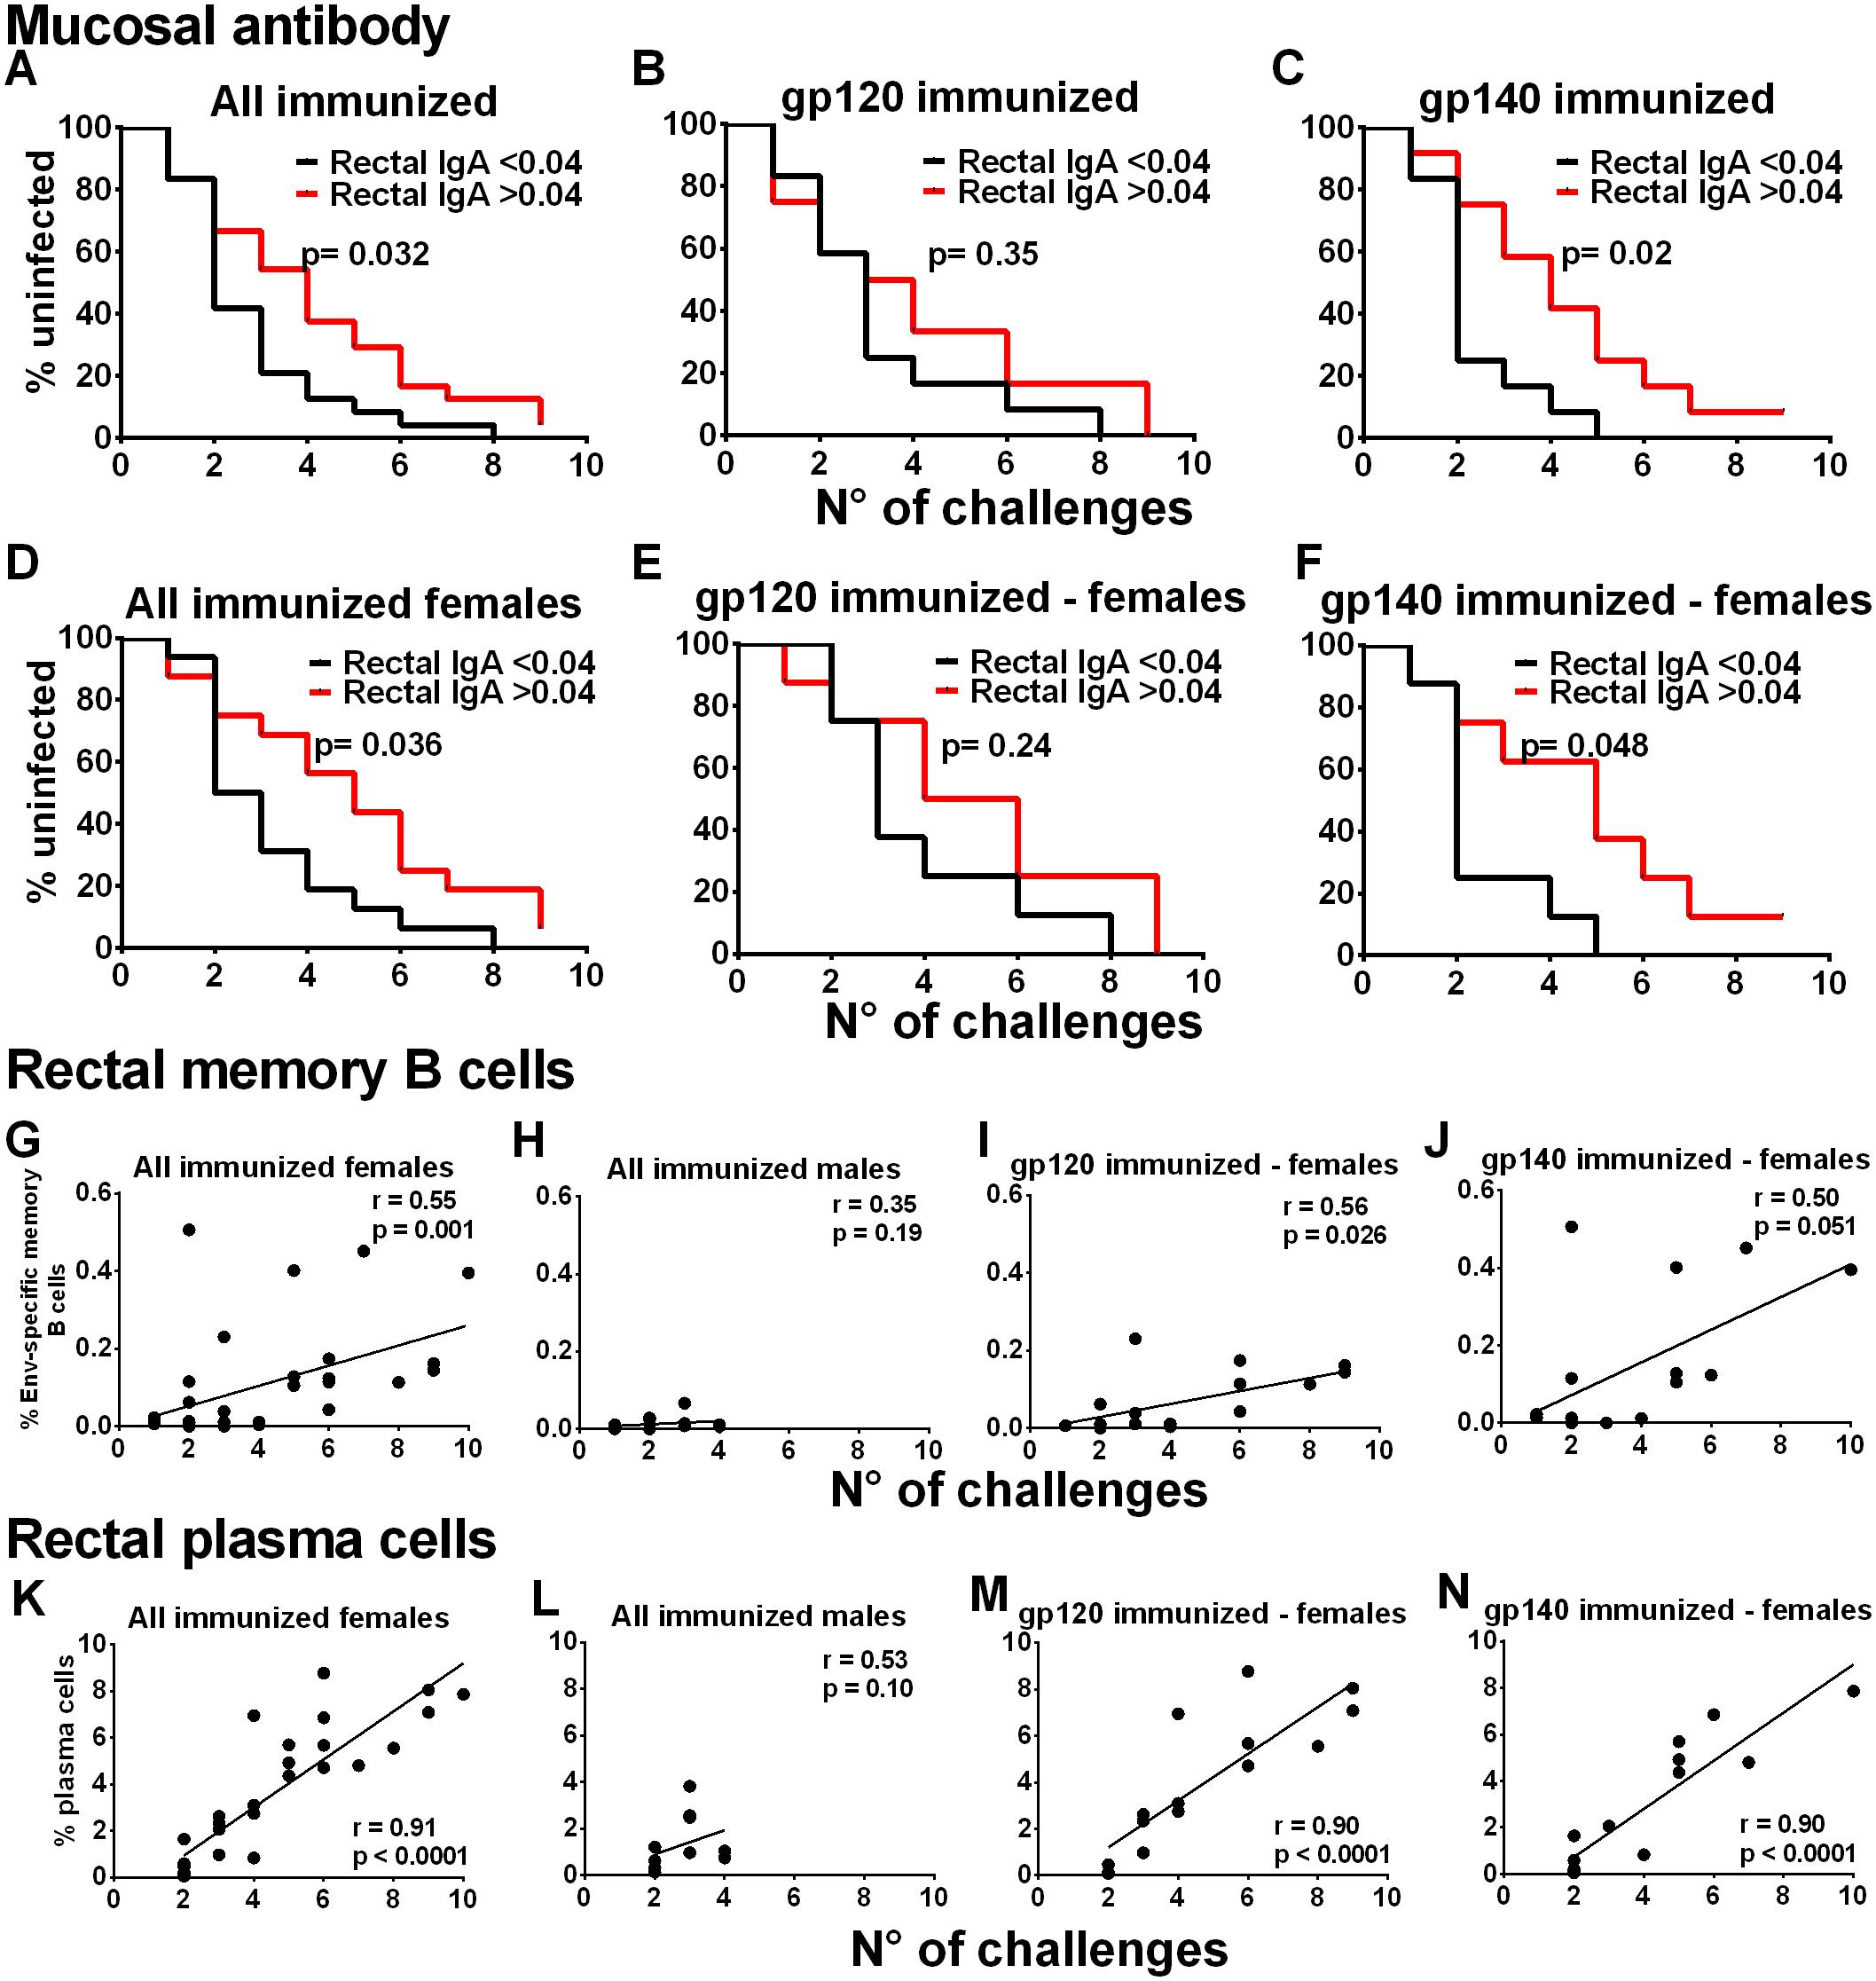 Immunological correlates of delayed SIV acquisition.